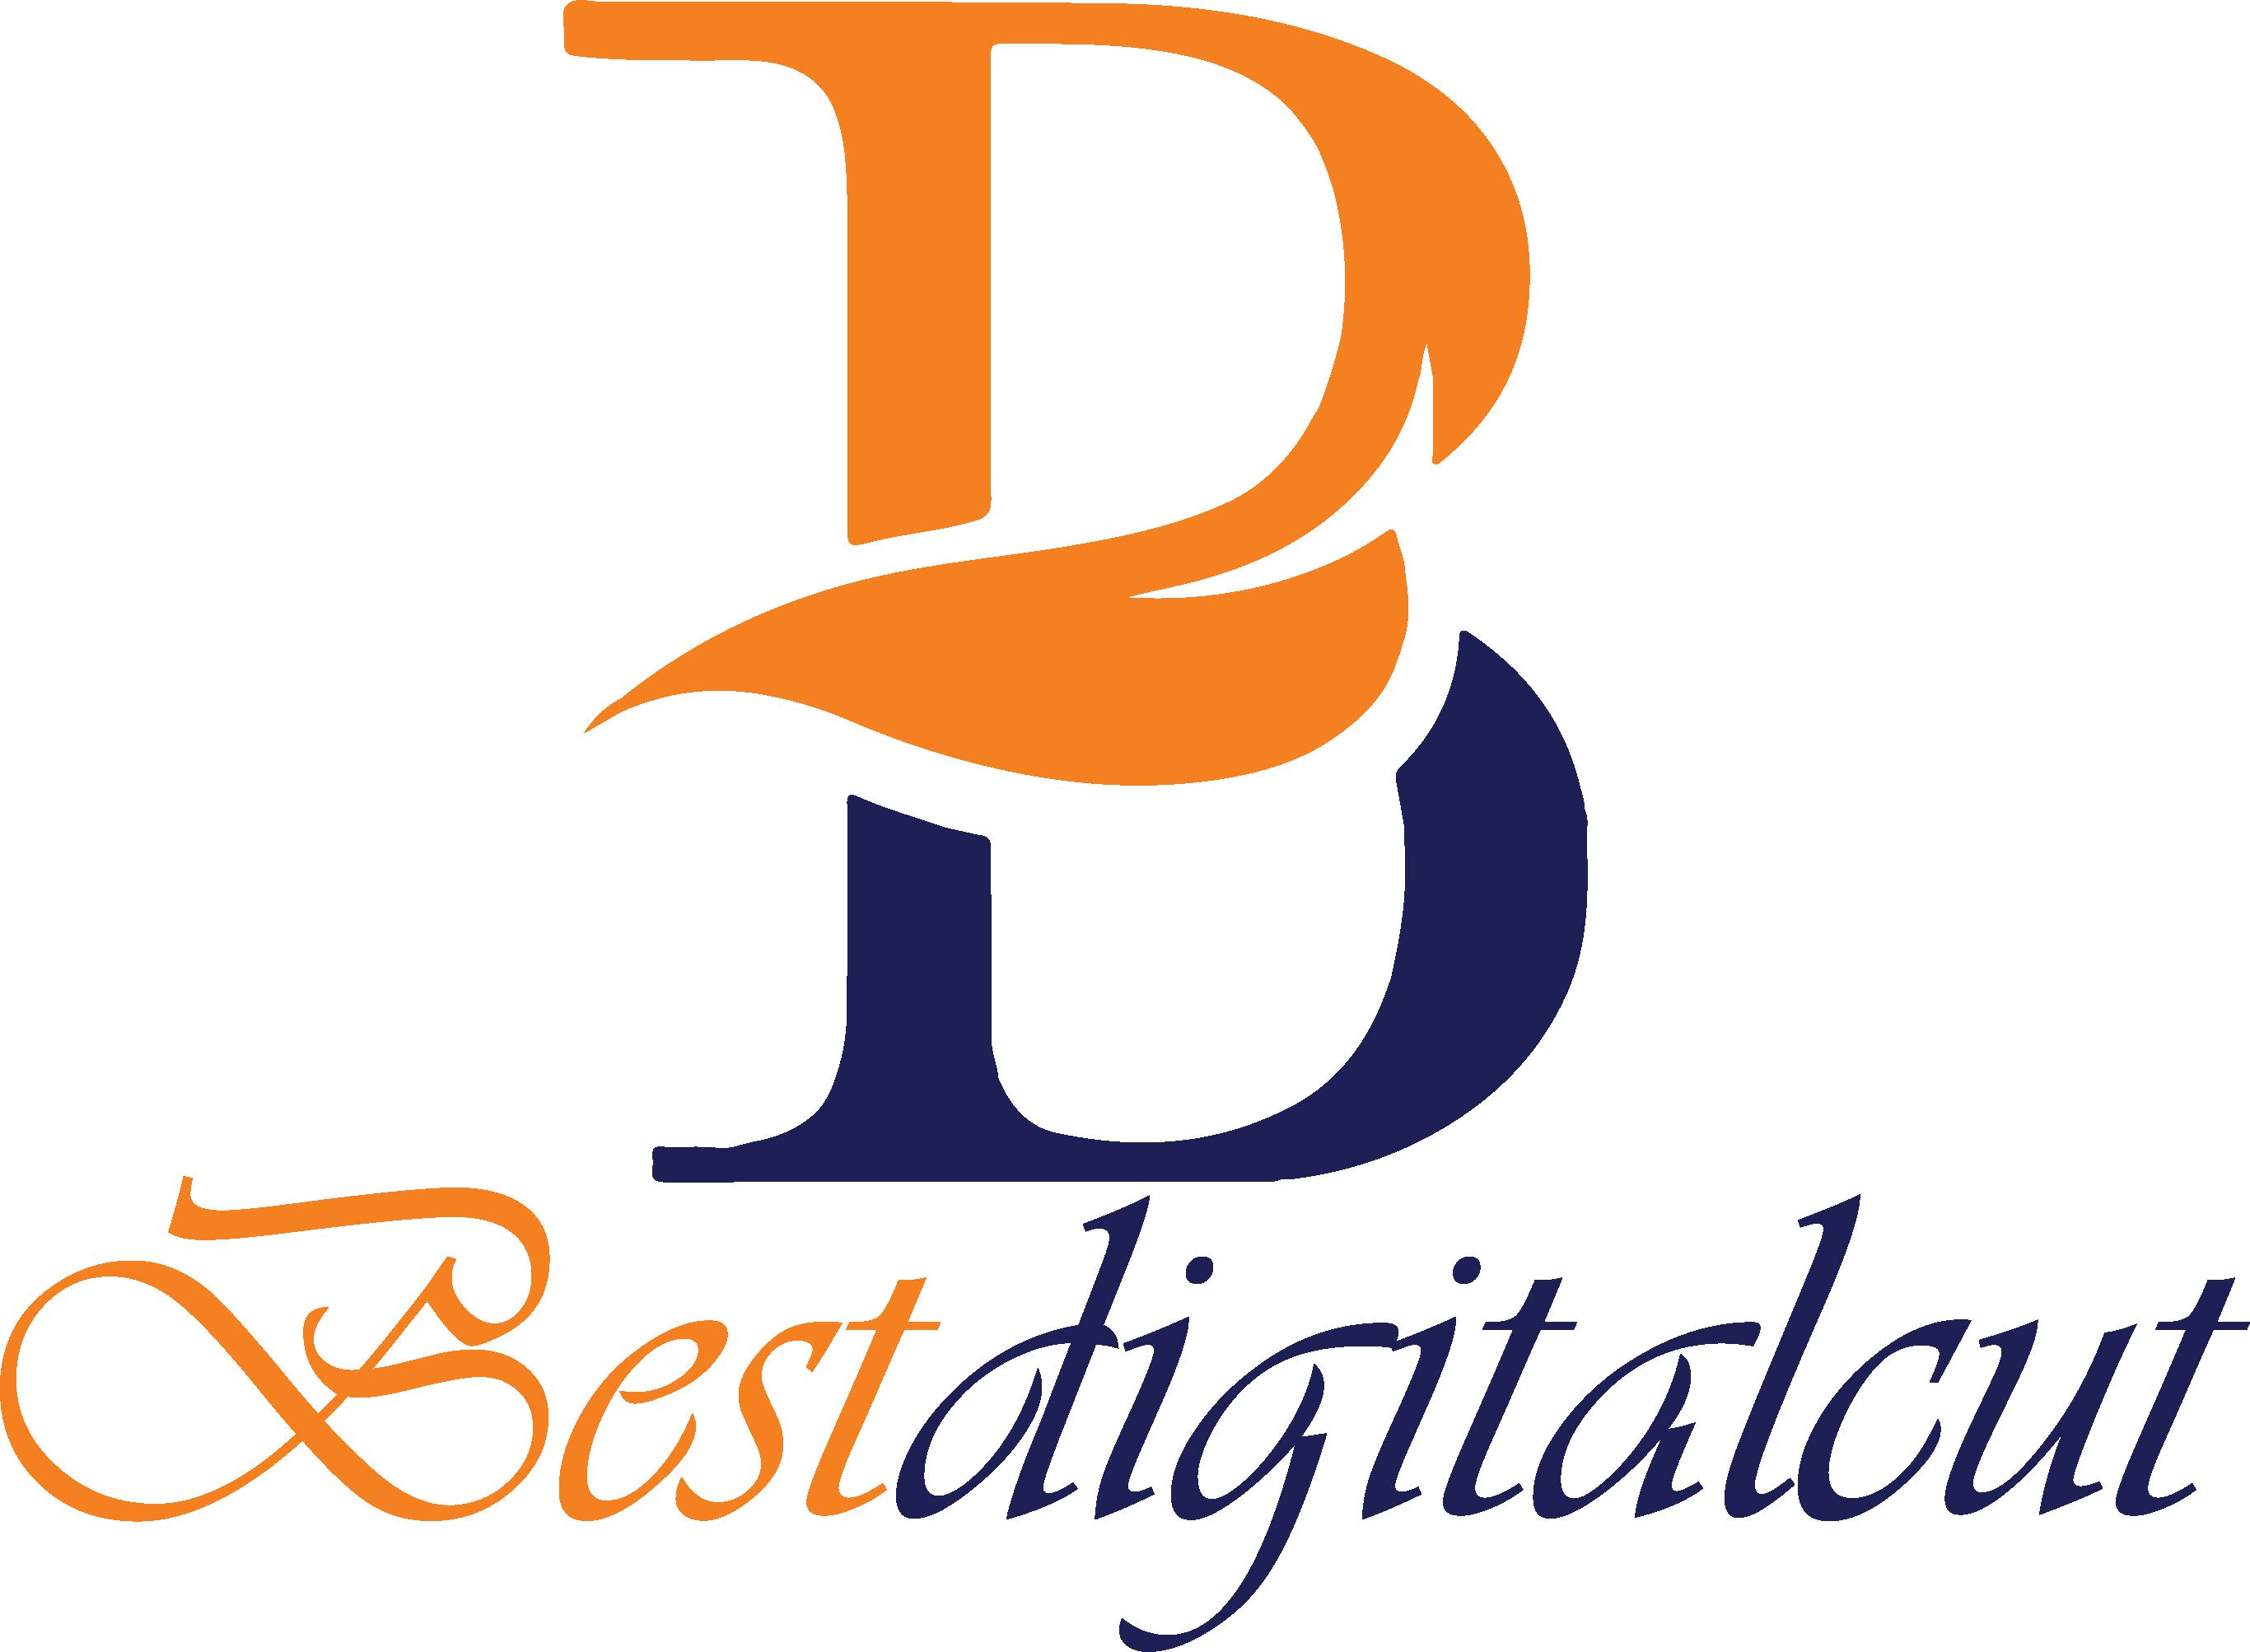 Best Digital Cut